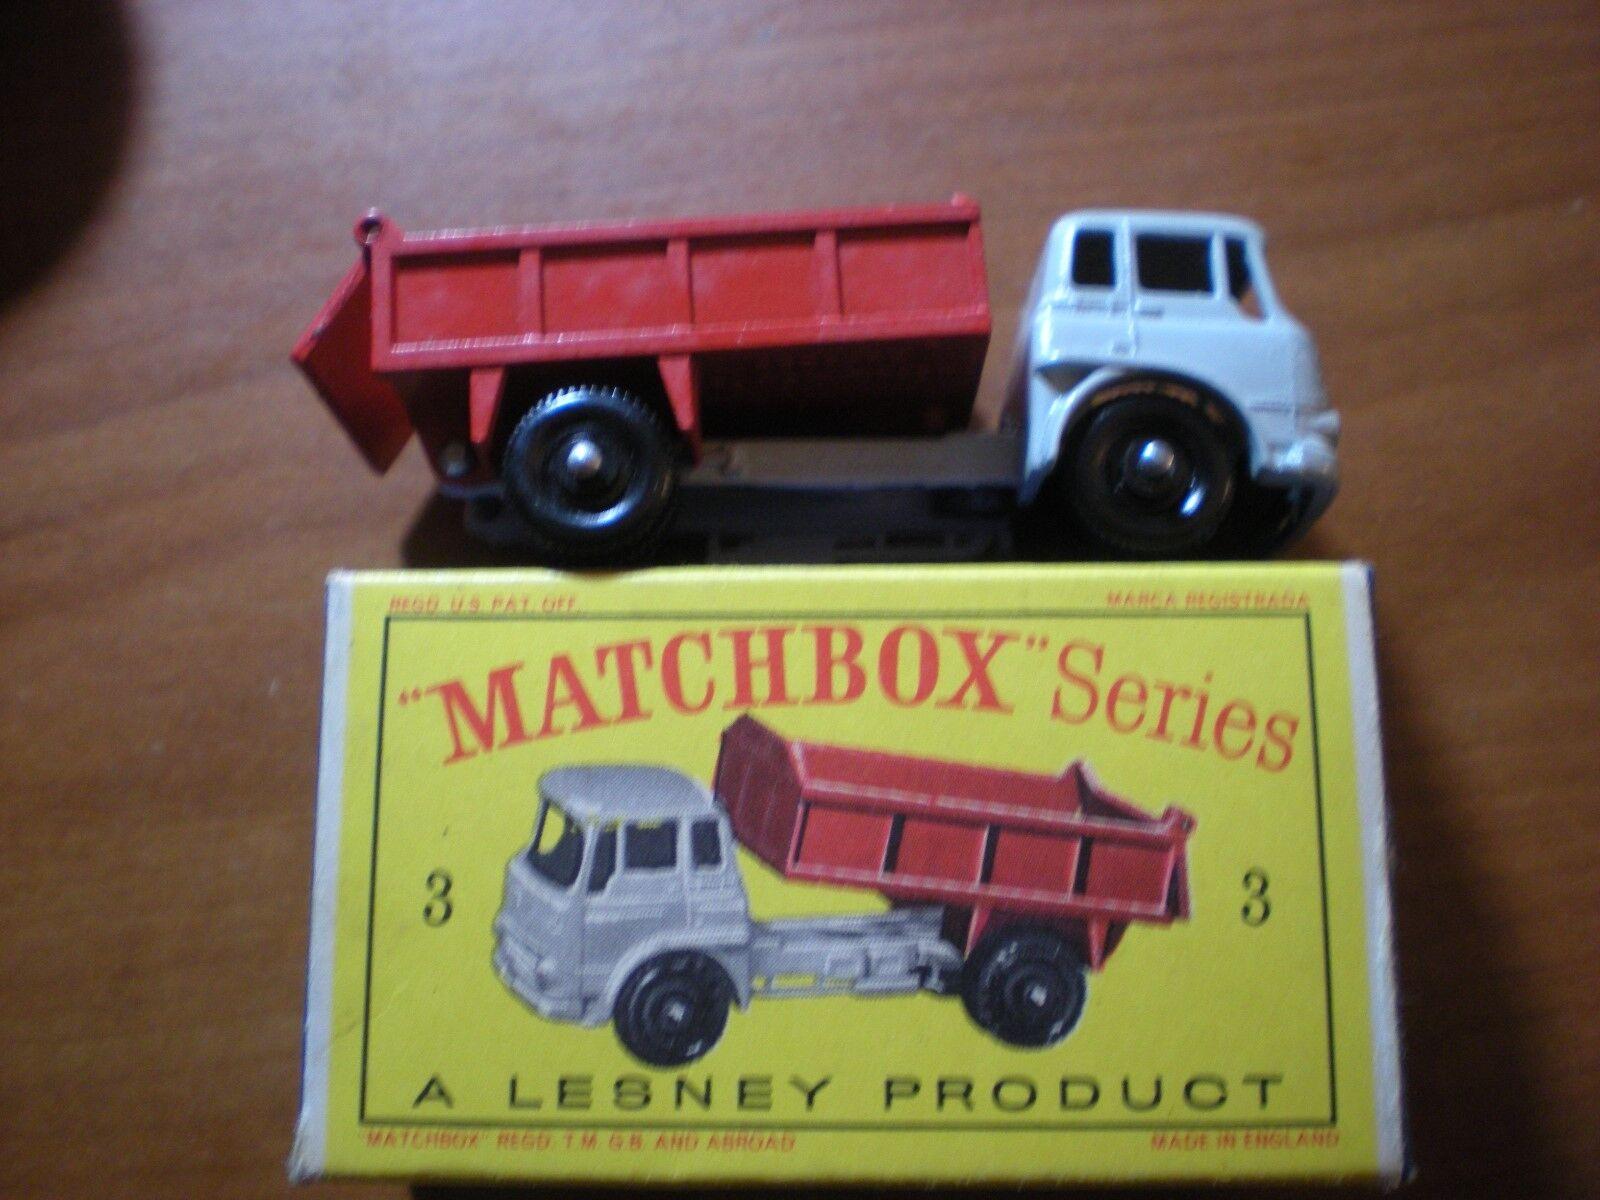 precio mas barato Nuevo Y En Caja Raro Matchbox Matchbox Matchbox  3 Bedford 7 1 2 TONELADA VOLQUETE ruedas de plástico negro por Lesney  de moda